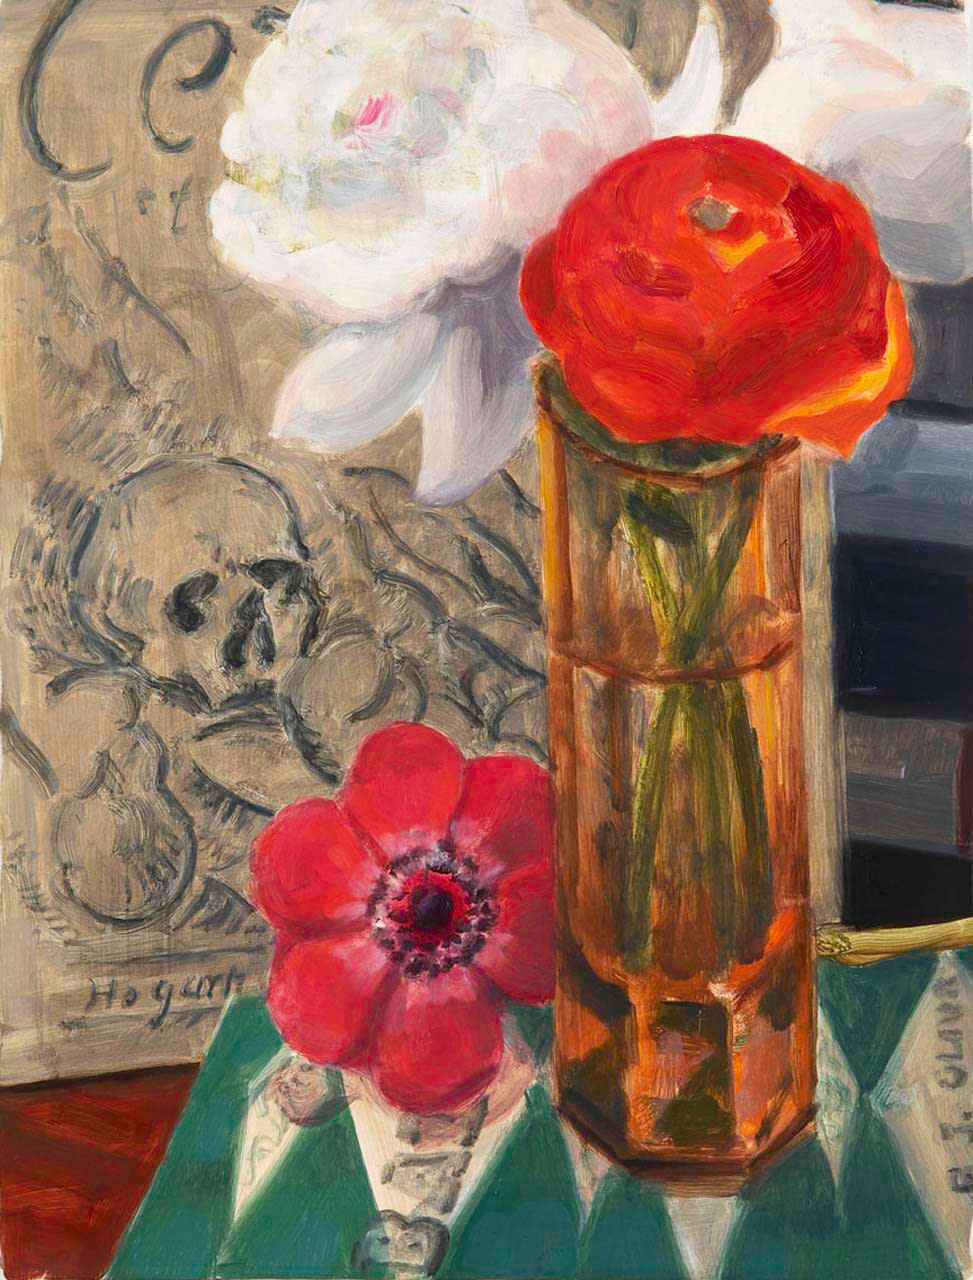 "<div class=""artwork_caption""><p>Cezanne + Balzac, 2009</p></div>"